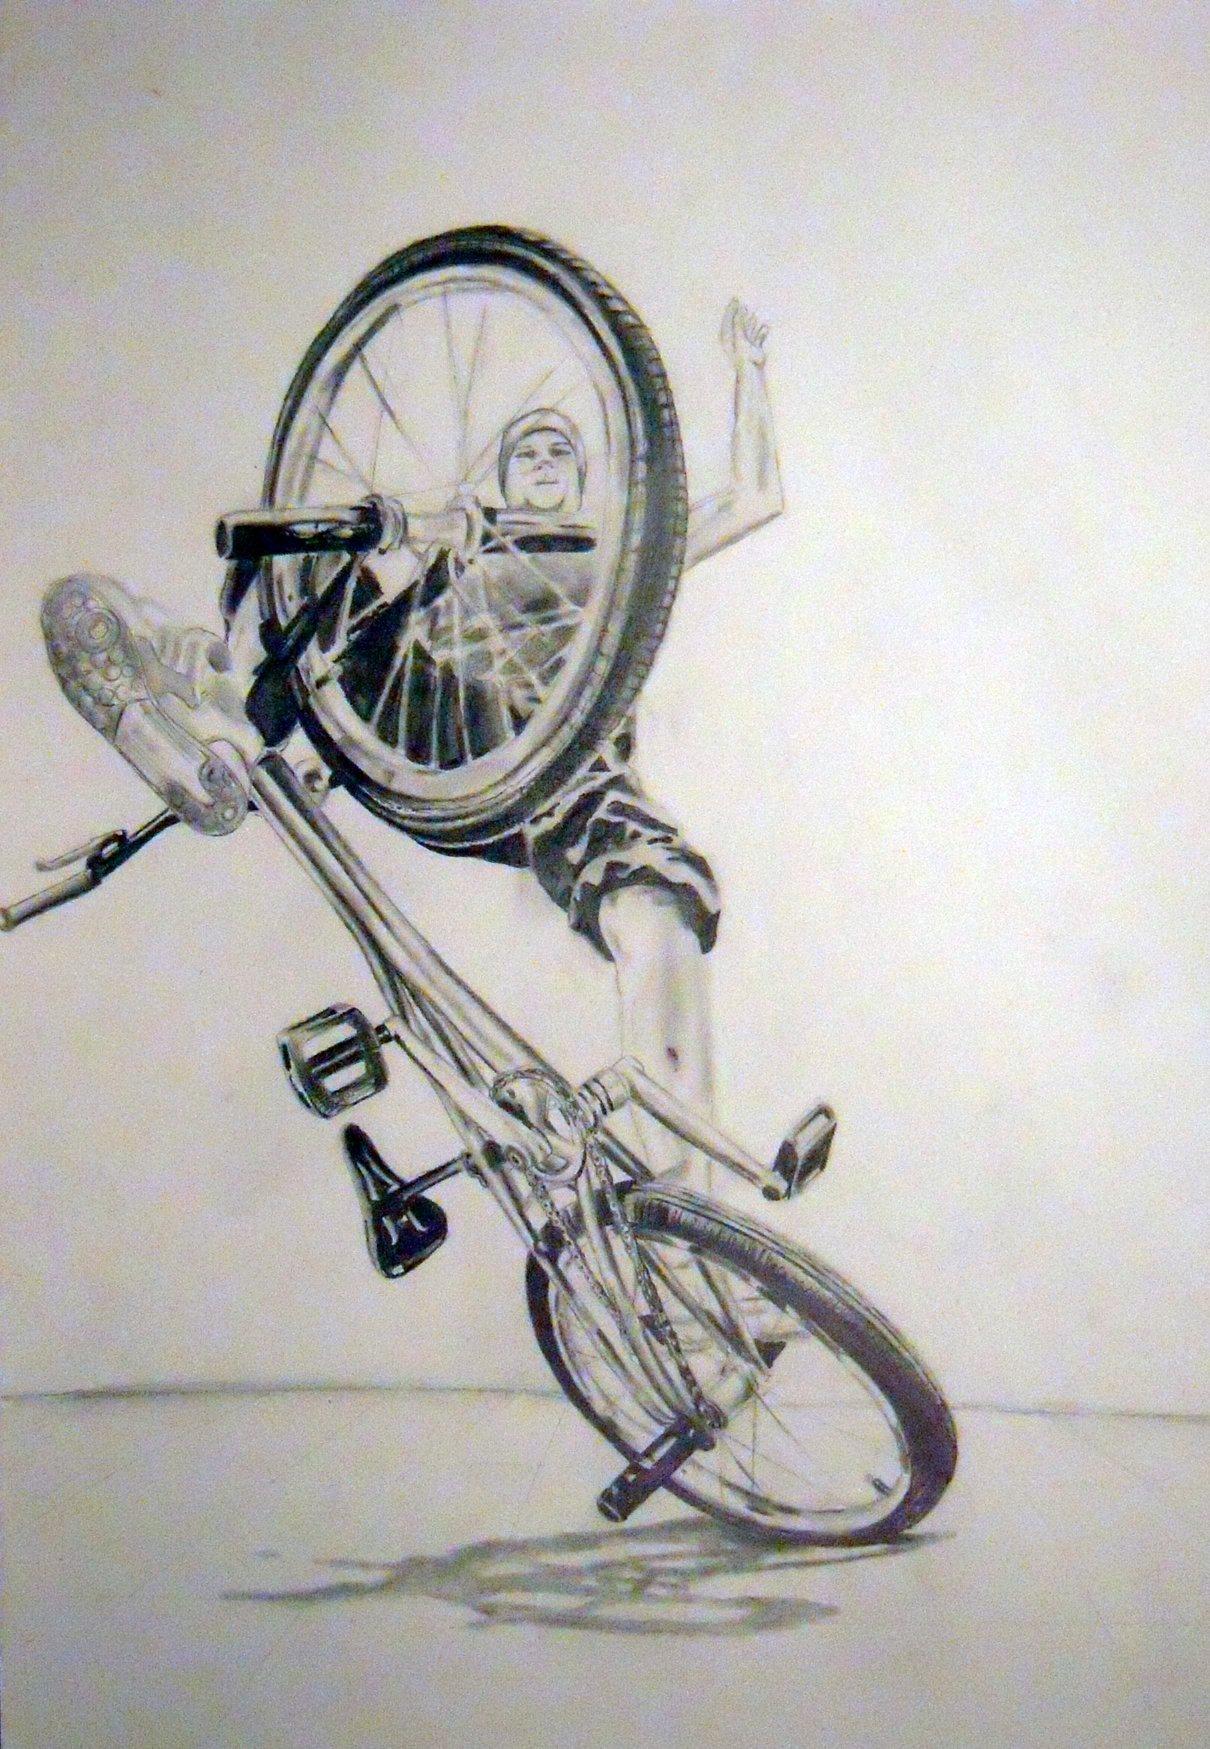 Risd Bike Drawing Pictures Newschoolerscom